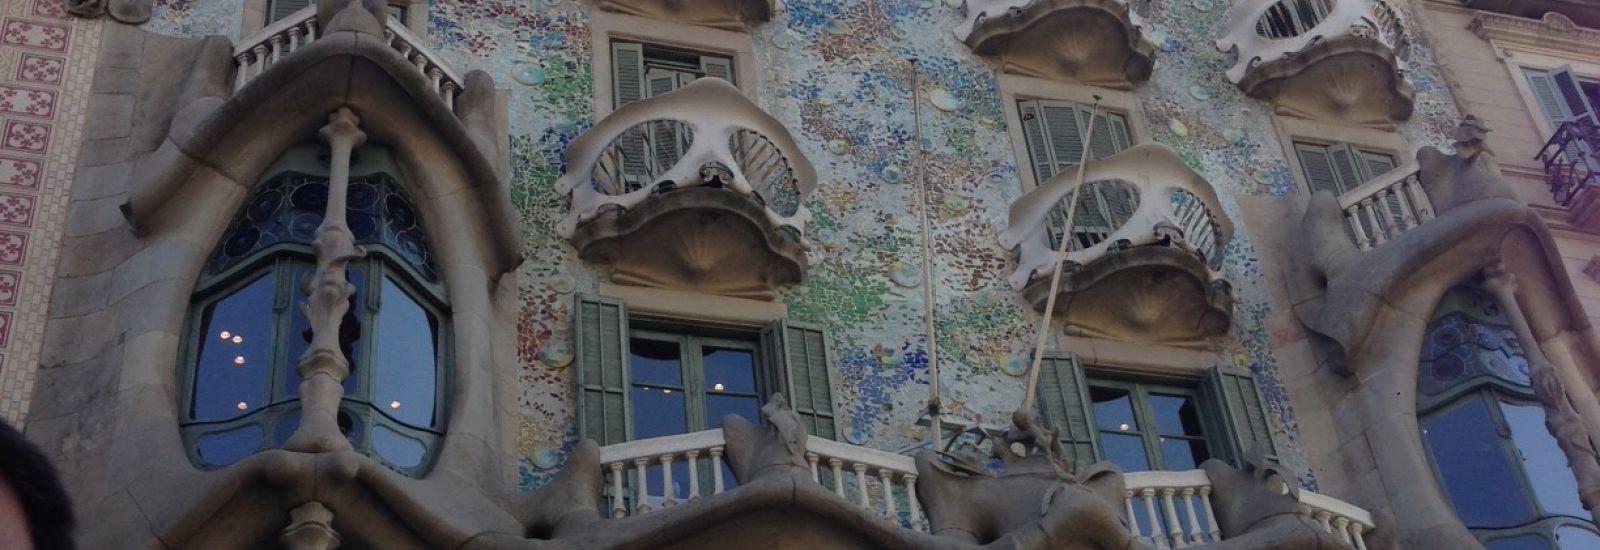 Casa Battló by Antoni Gaudí, Passeig de Gràcia, Barcelona